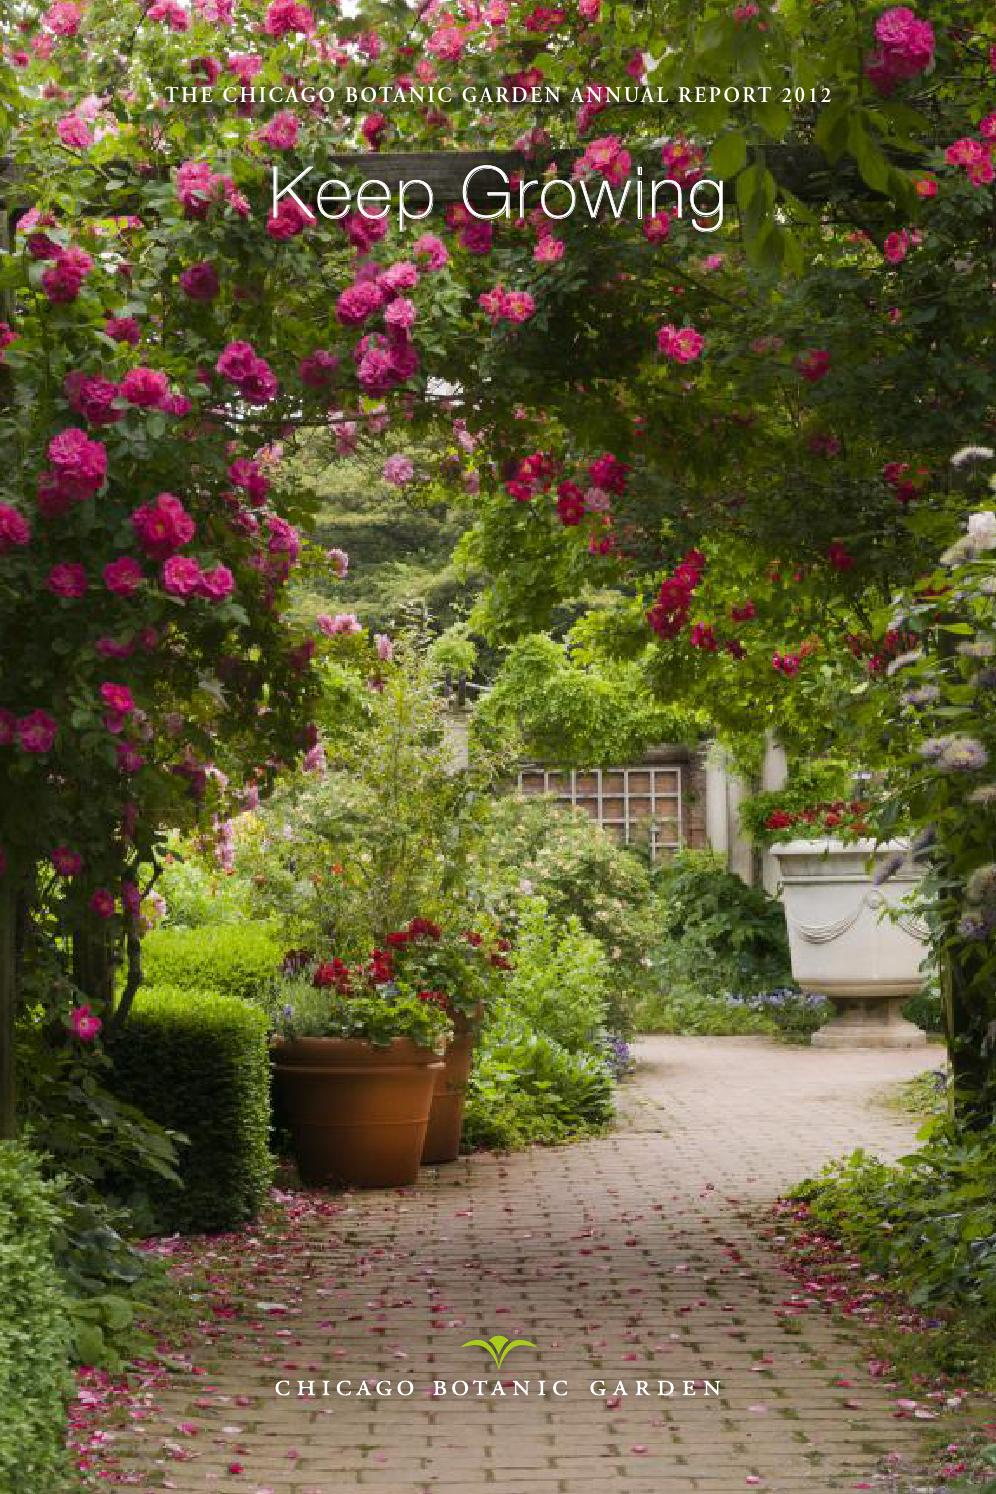 Annual report 2012 by chicago botanic garden issuu for Chicago botanic garden membership